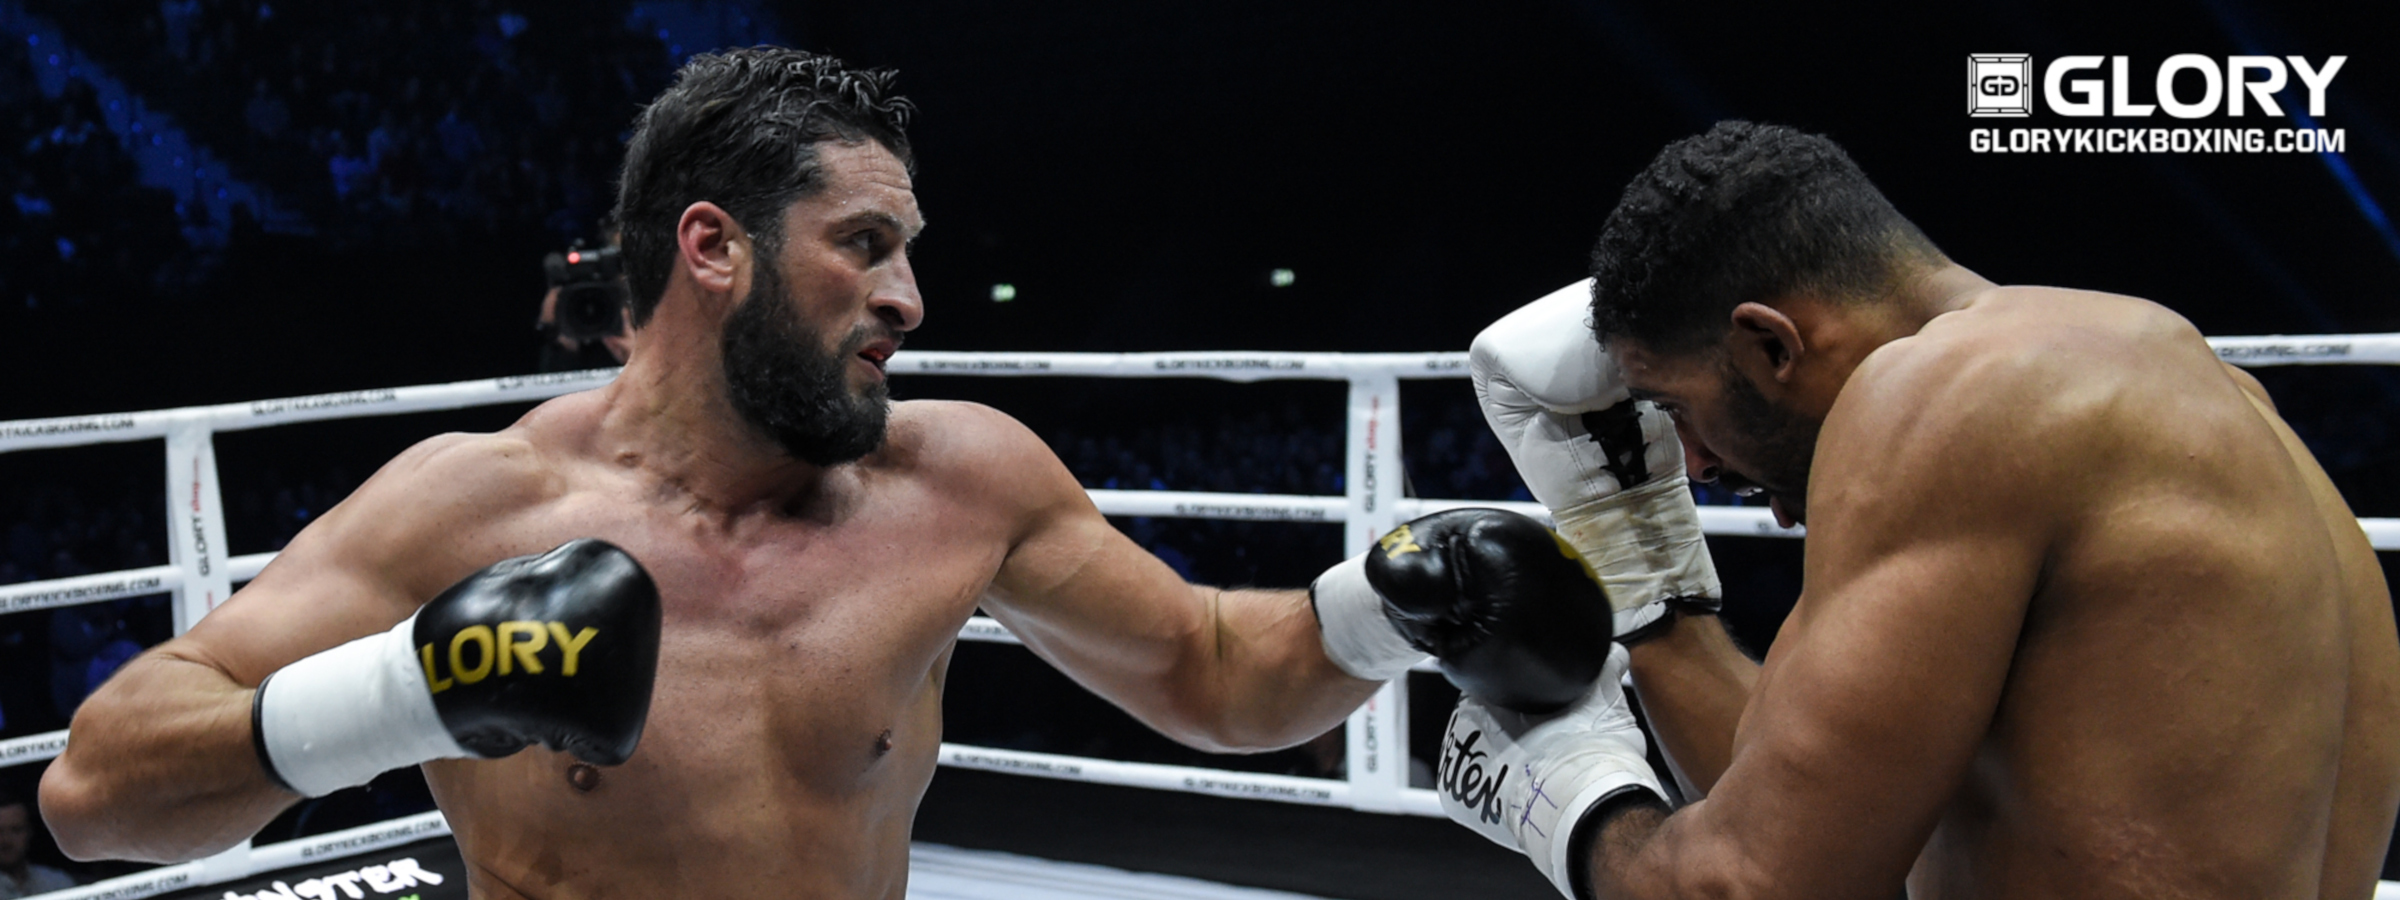 Jamal The Goliath Ben Saddik : Glory Kickboxing